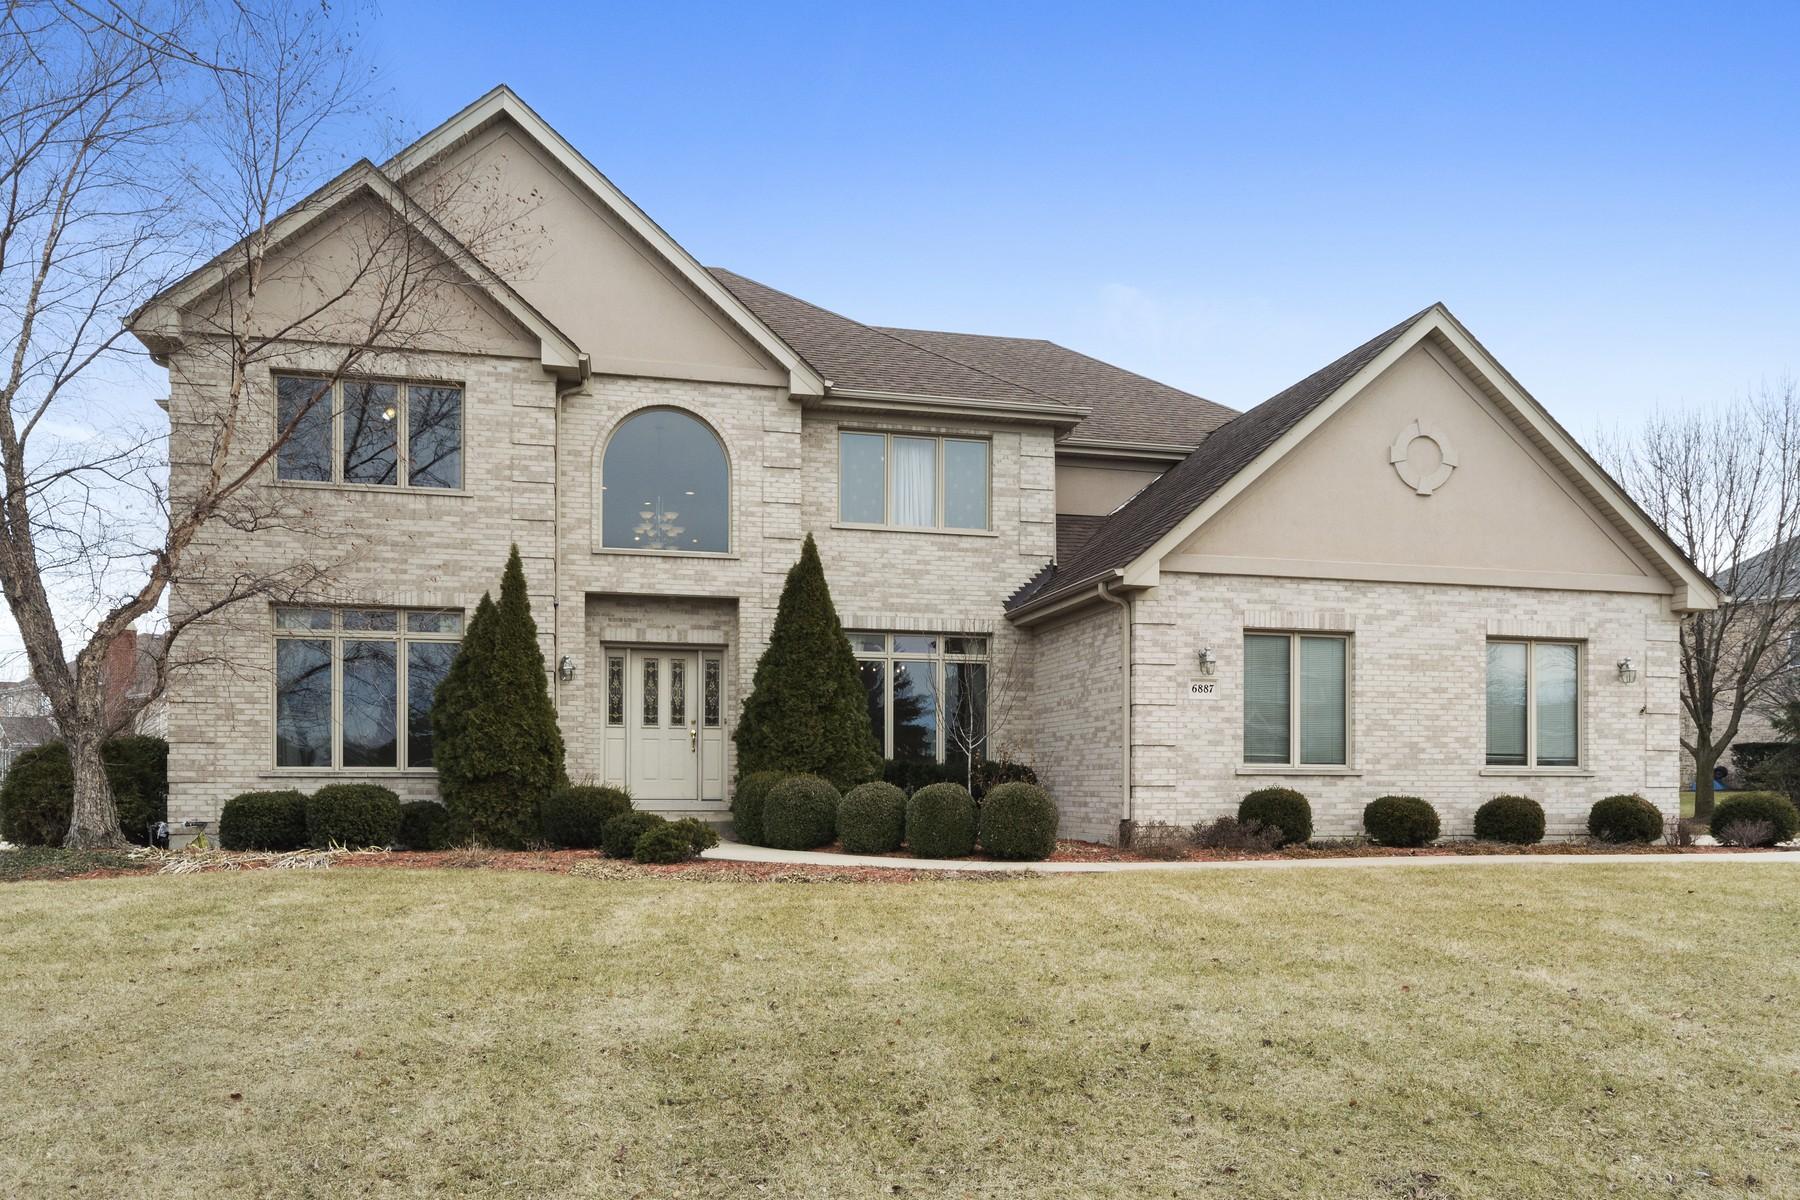 Vivienda unifamiliar por un Venta en Prominently Positioned Burr Ridge Home 6887 Fieldstone Drive Burr Ridge, Illinois, 60527 Estados Unidos